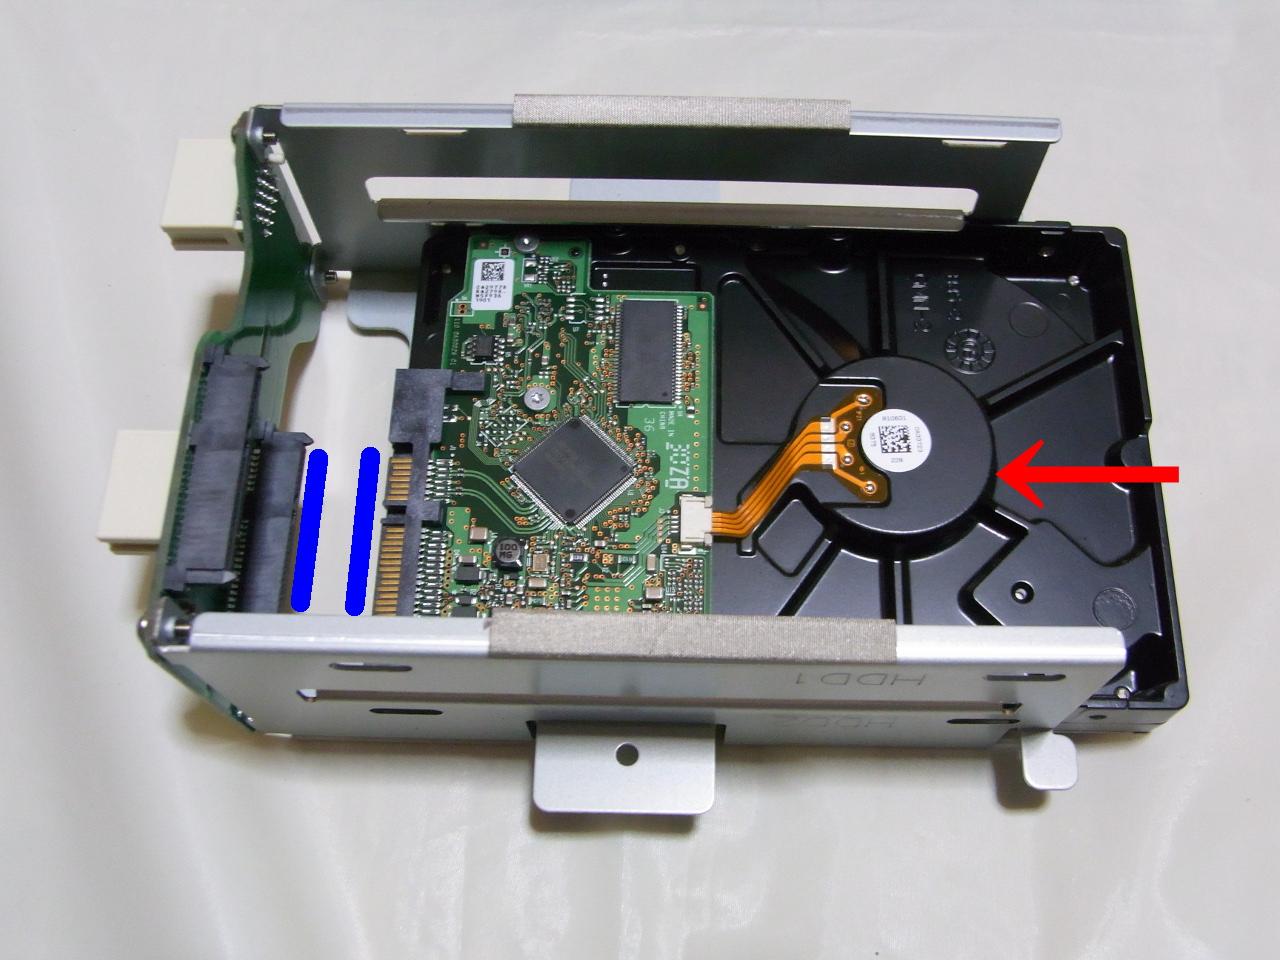 CG-HDC2EUS31-W のHDDトレイにHDDをセット